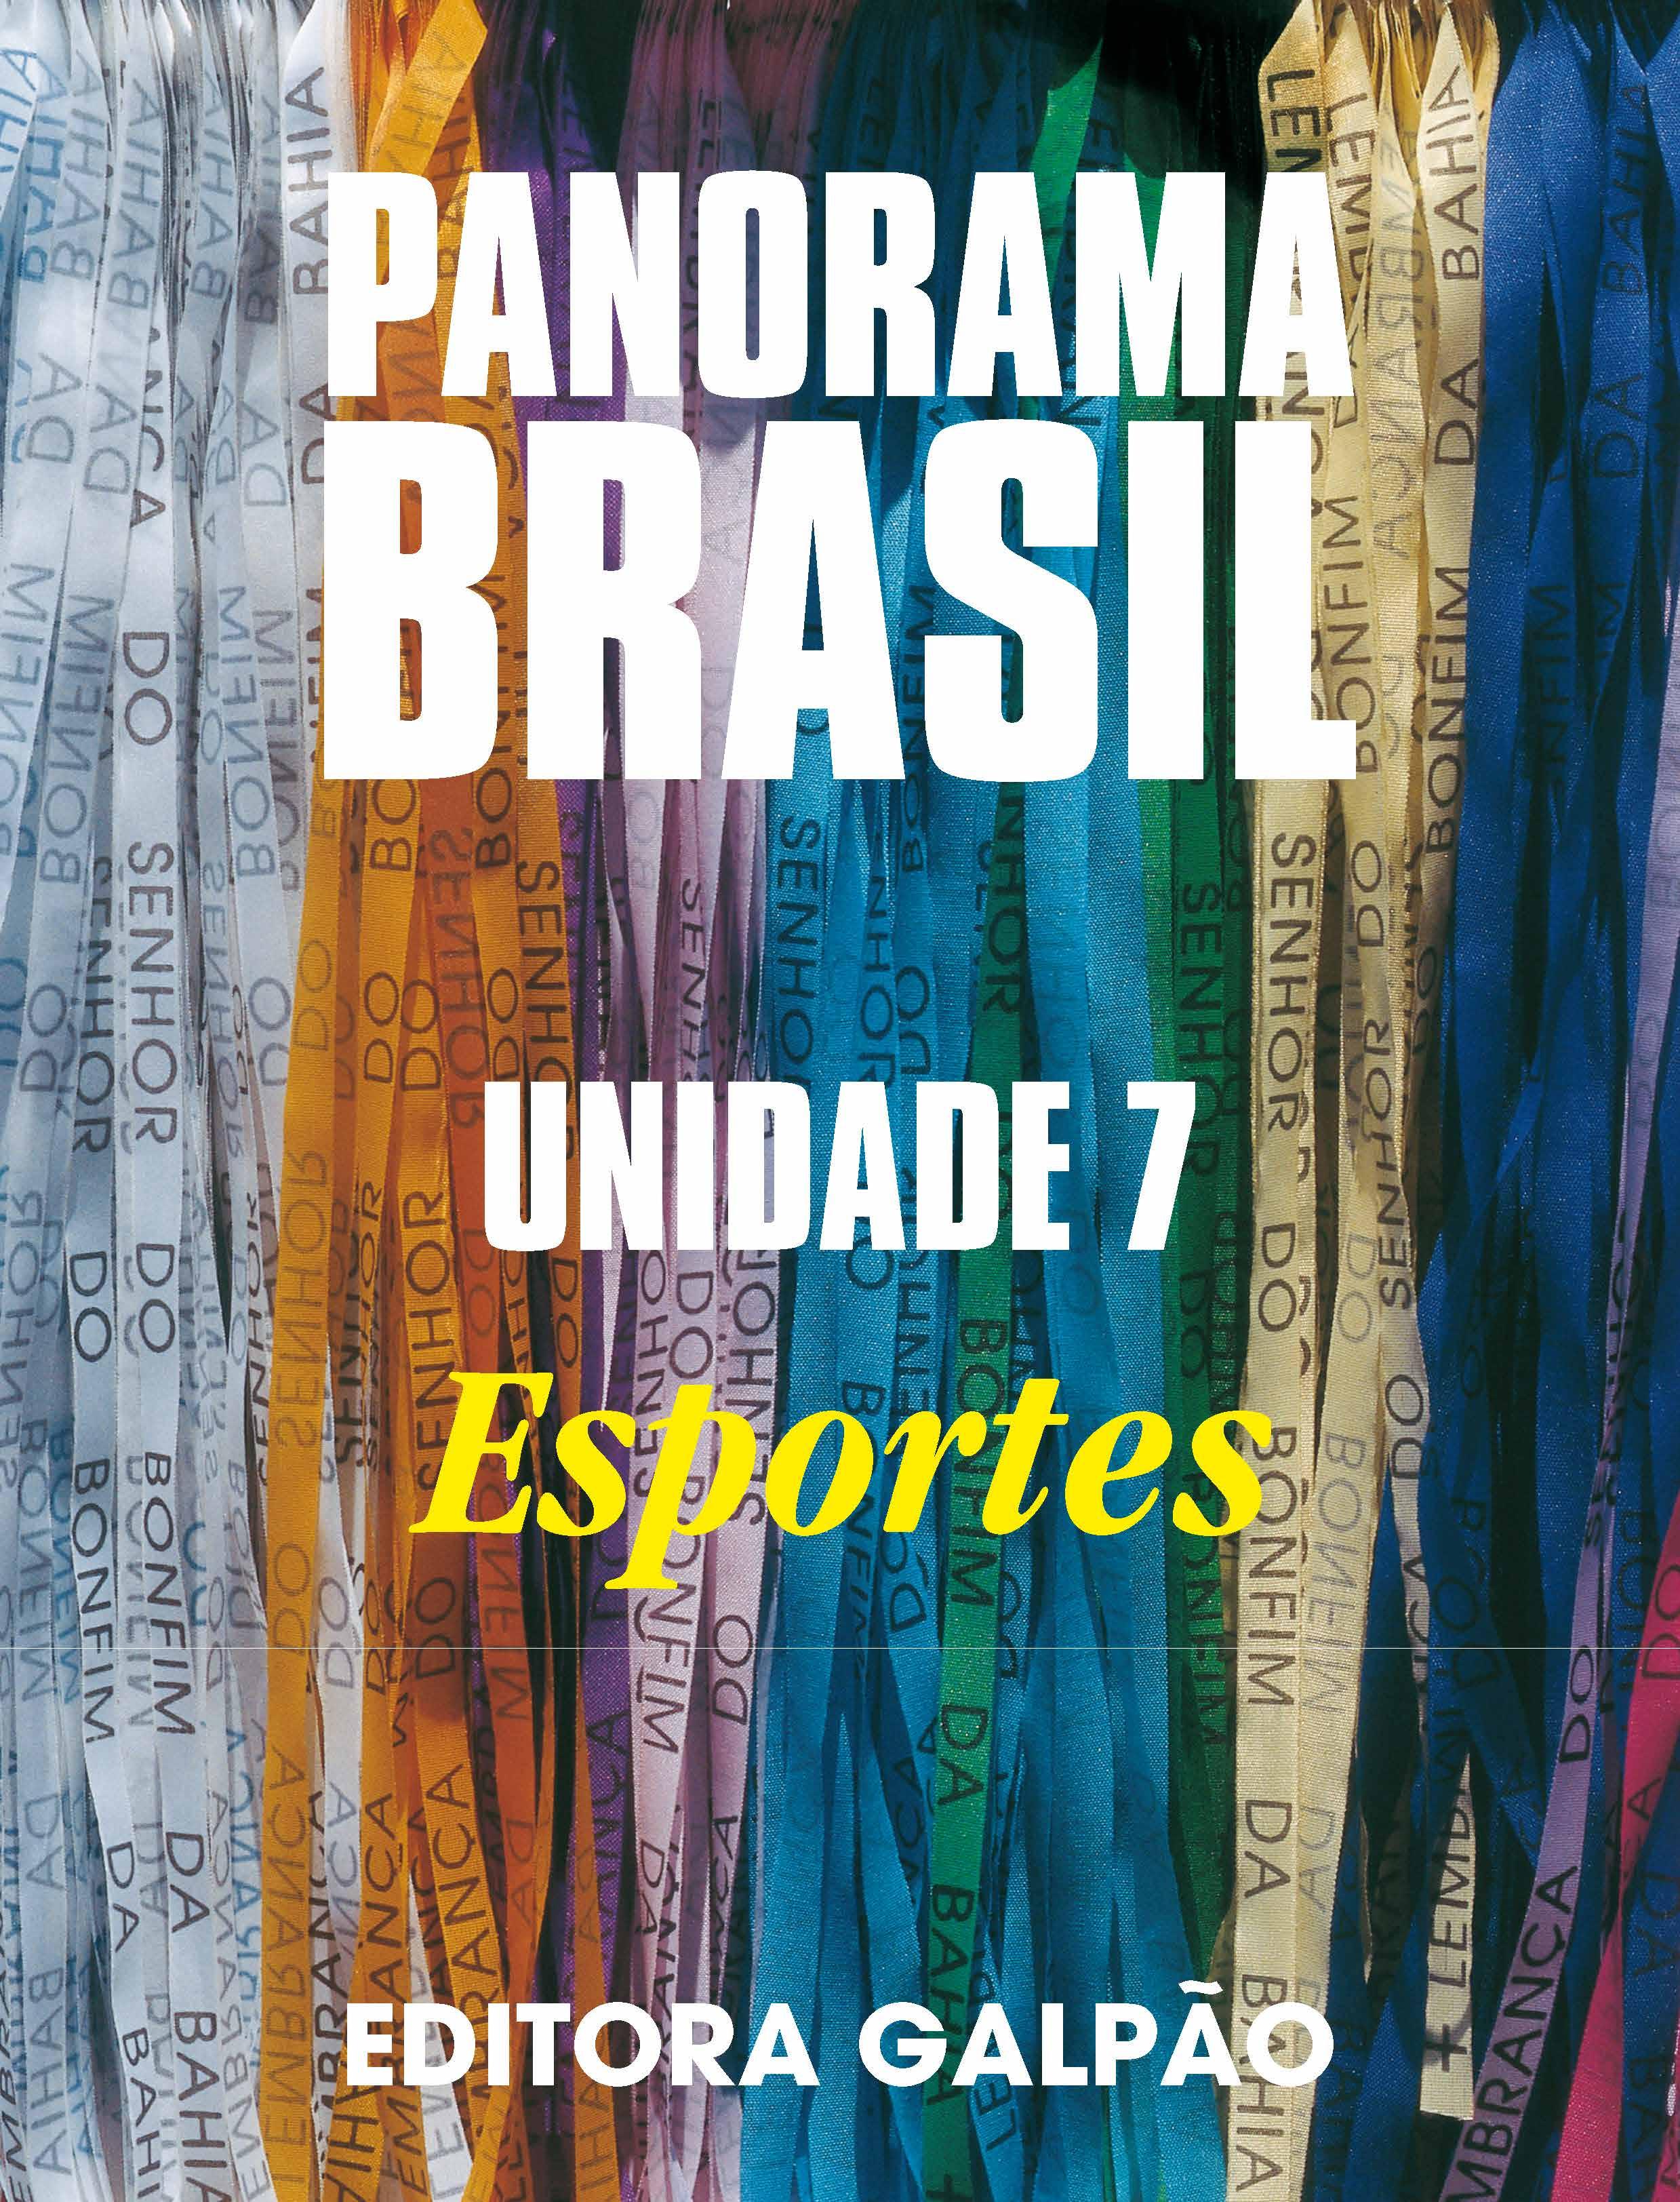 Panorama Brasil u.7 esportes (ebook)